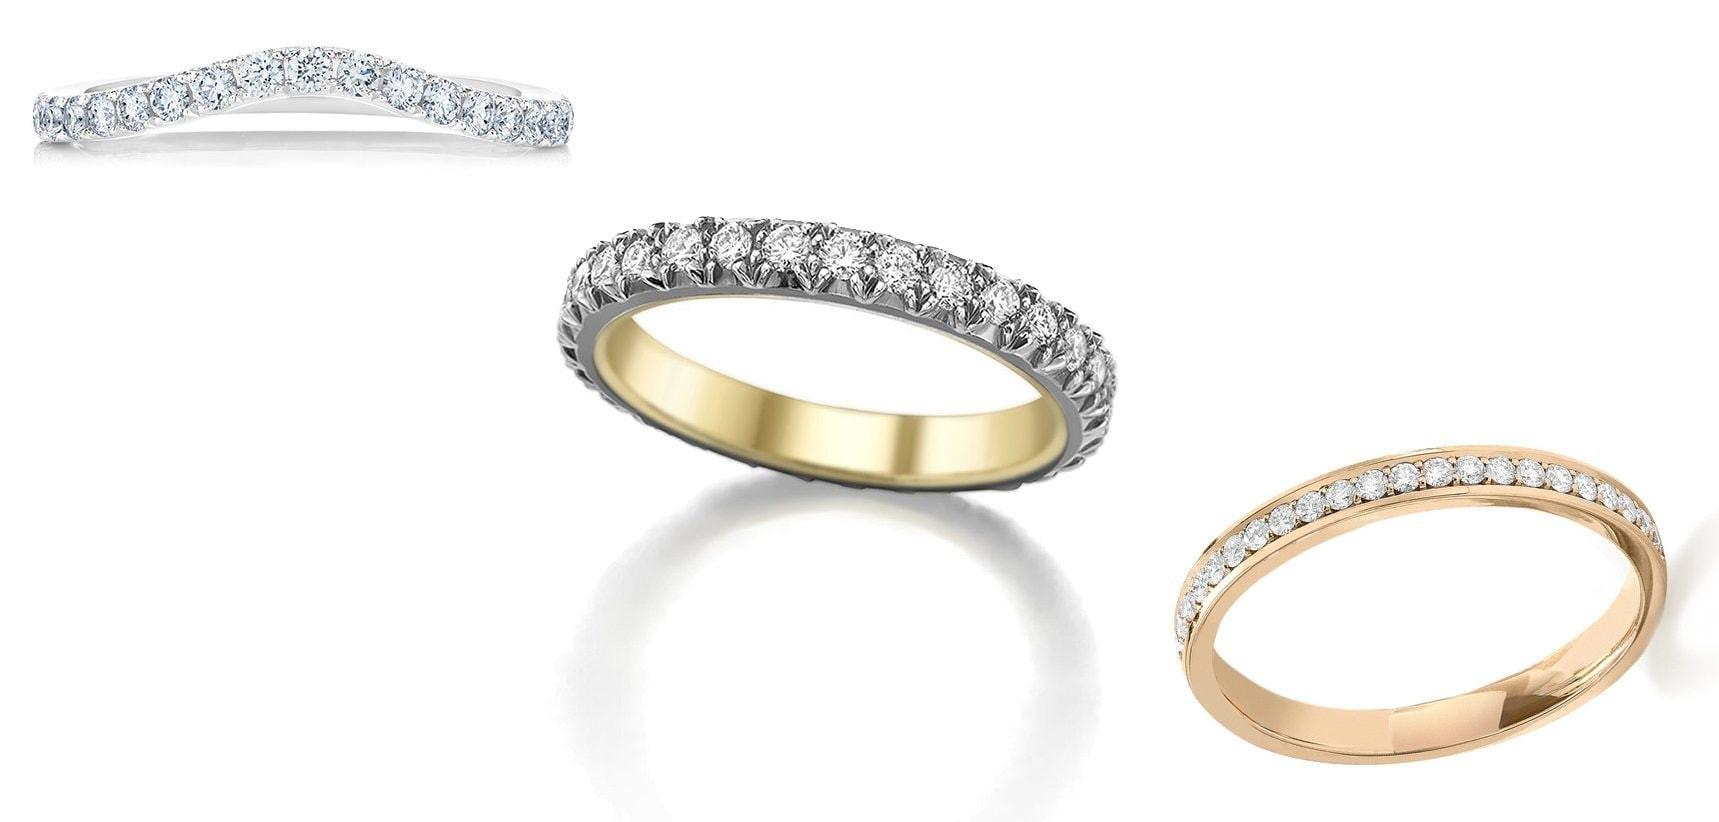 Bahan-Bahan Cincin Nikah Terbaik Dan Elegan